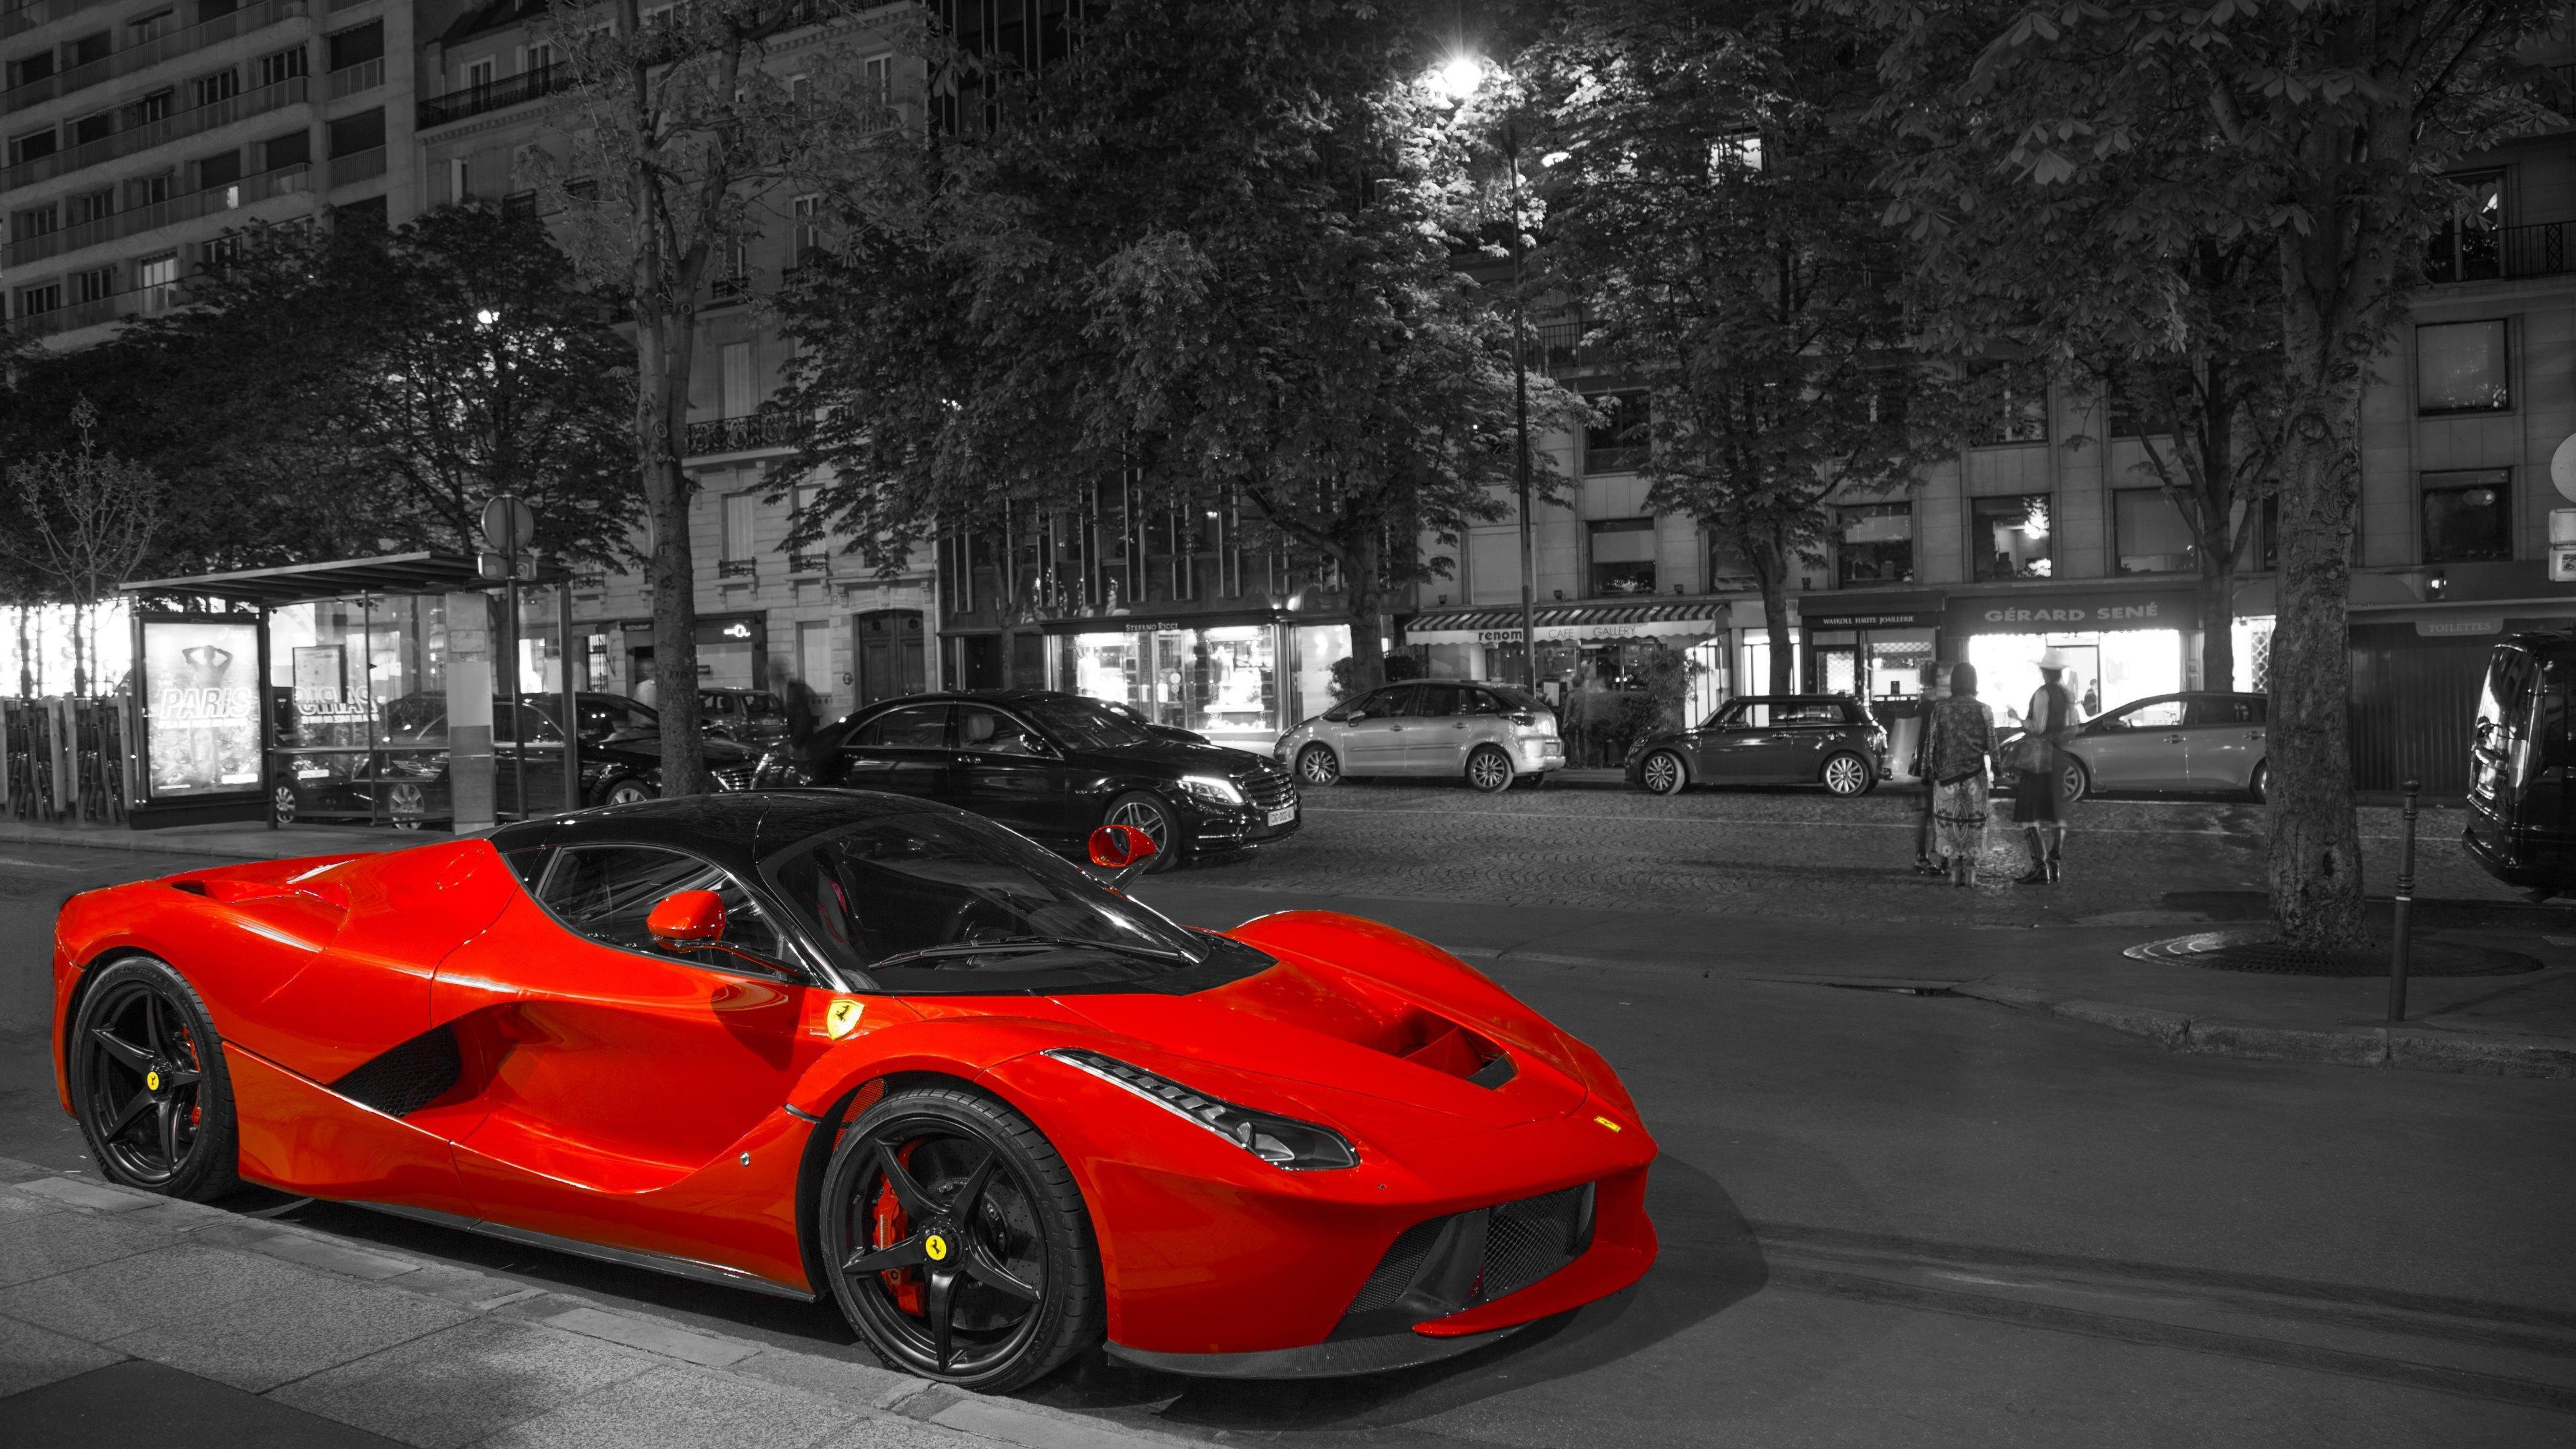 Best 4K Car Wallpapers - Top Free Best 4K Car Backgrounds ...